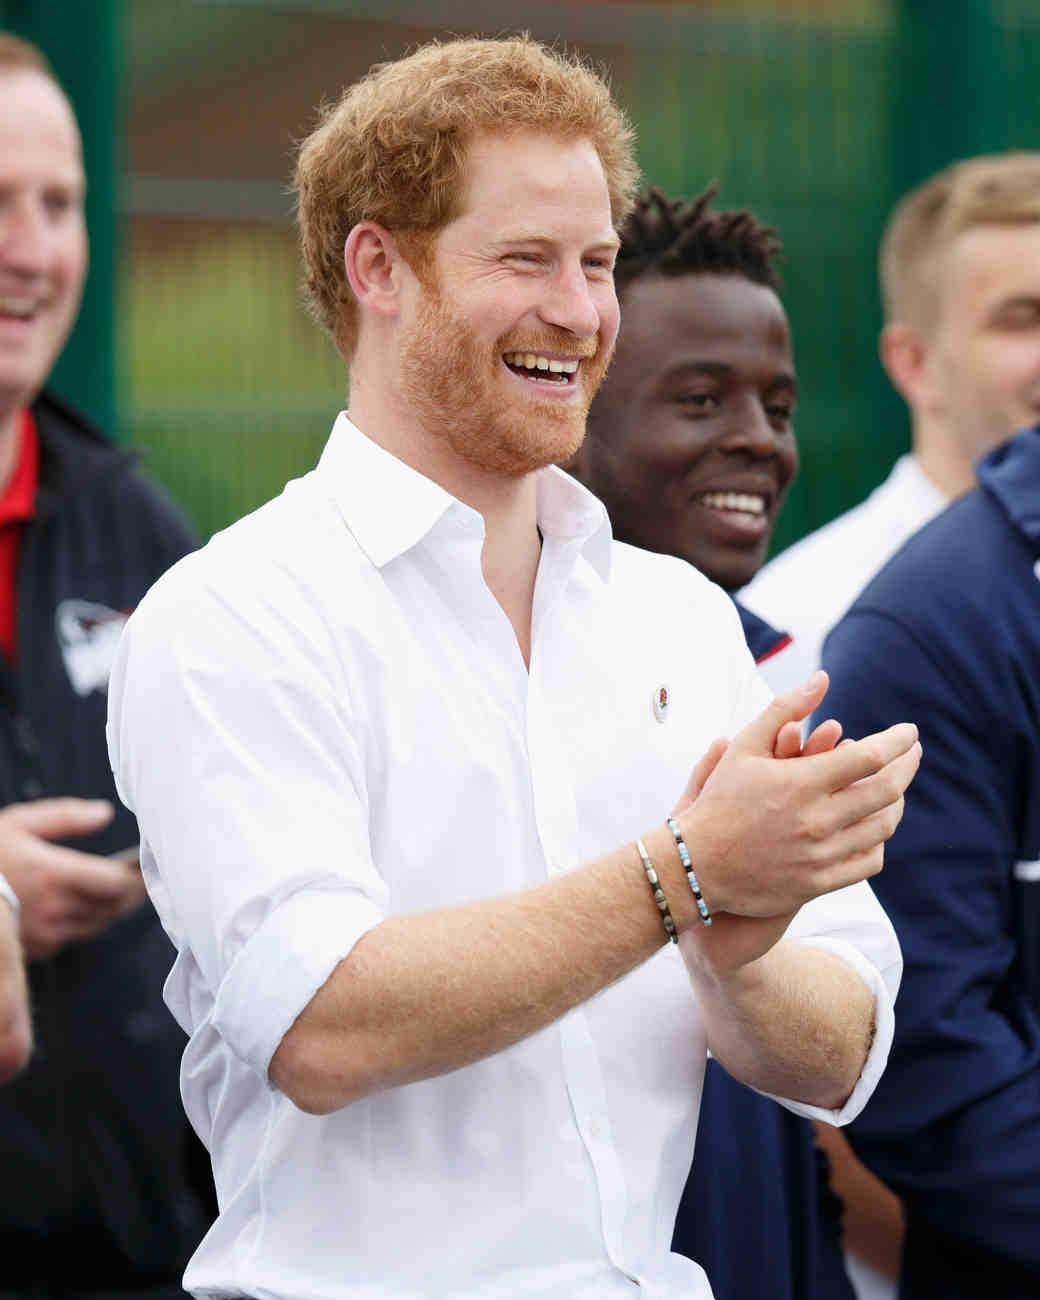 Prince Harry & Meghan Markle Just Received a Honeymoon Invitation